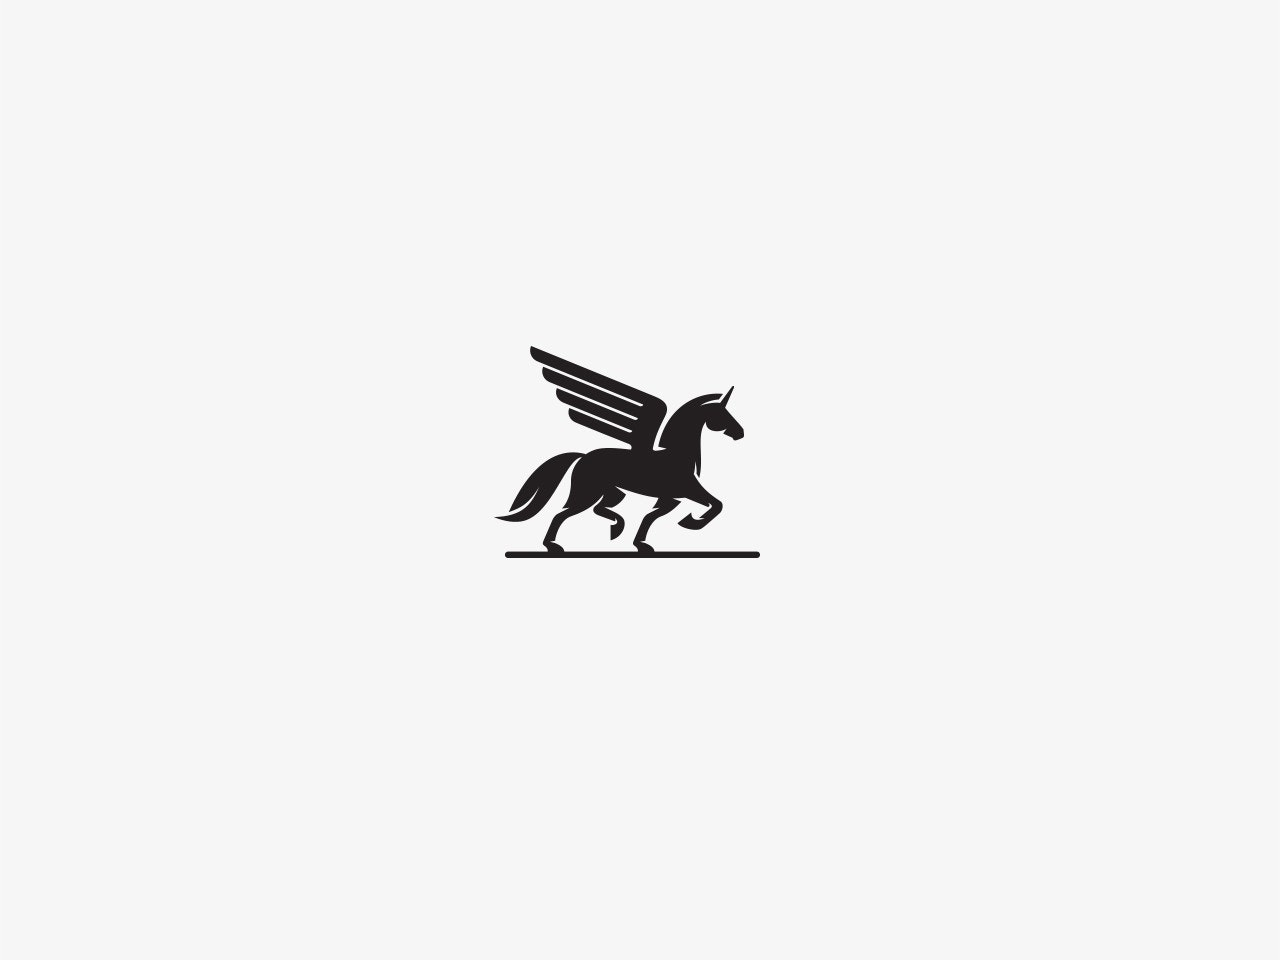 Unicorn-themed logo